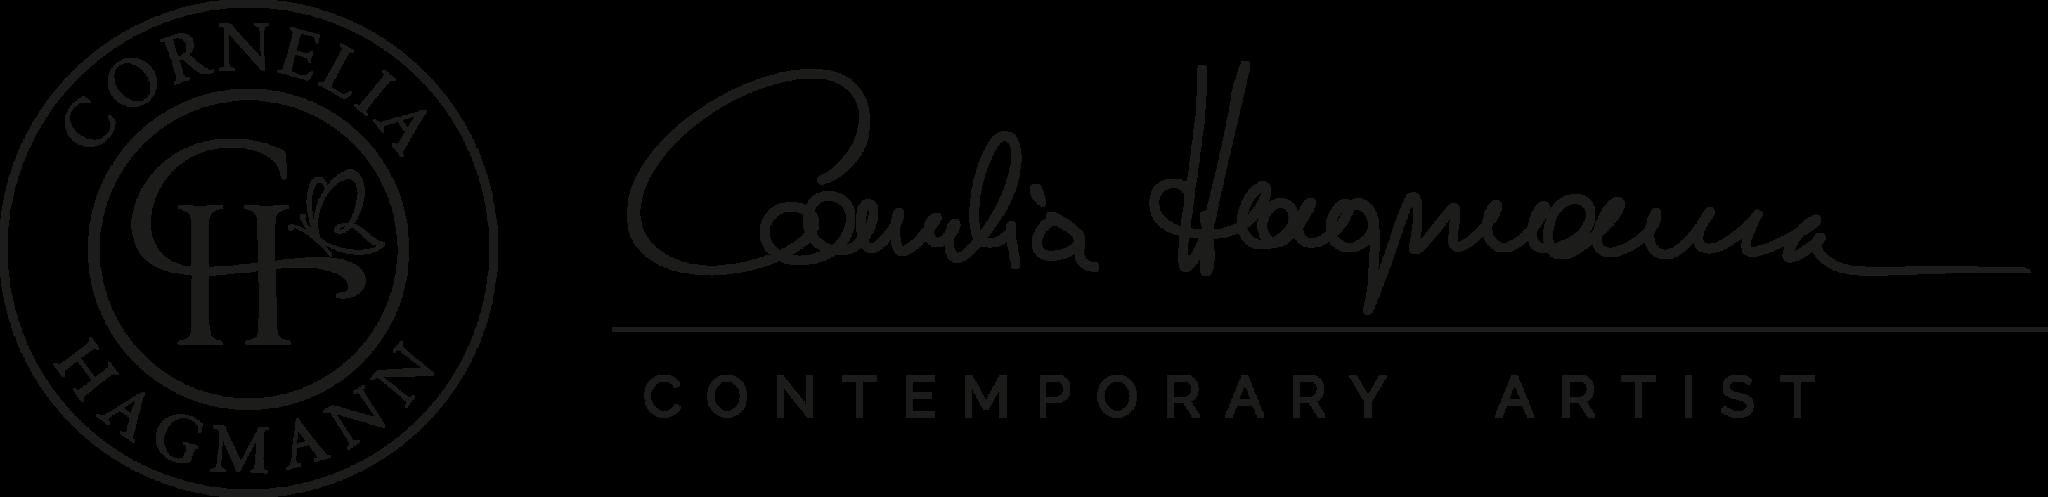 Logo Brand Cornelia Hagmann horizontal